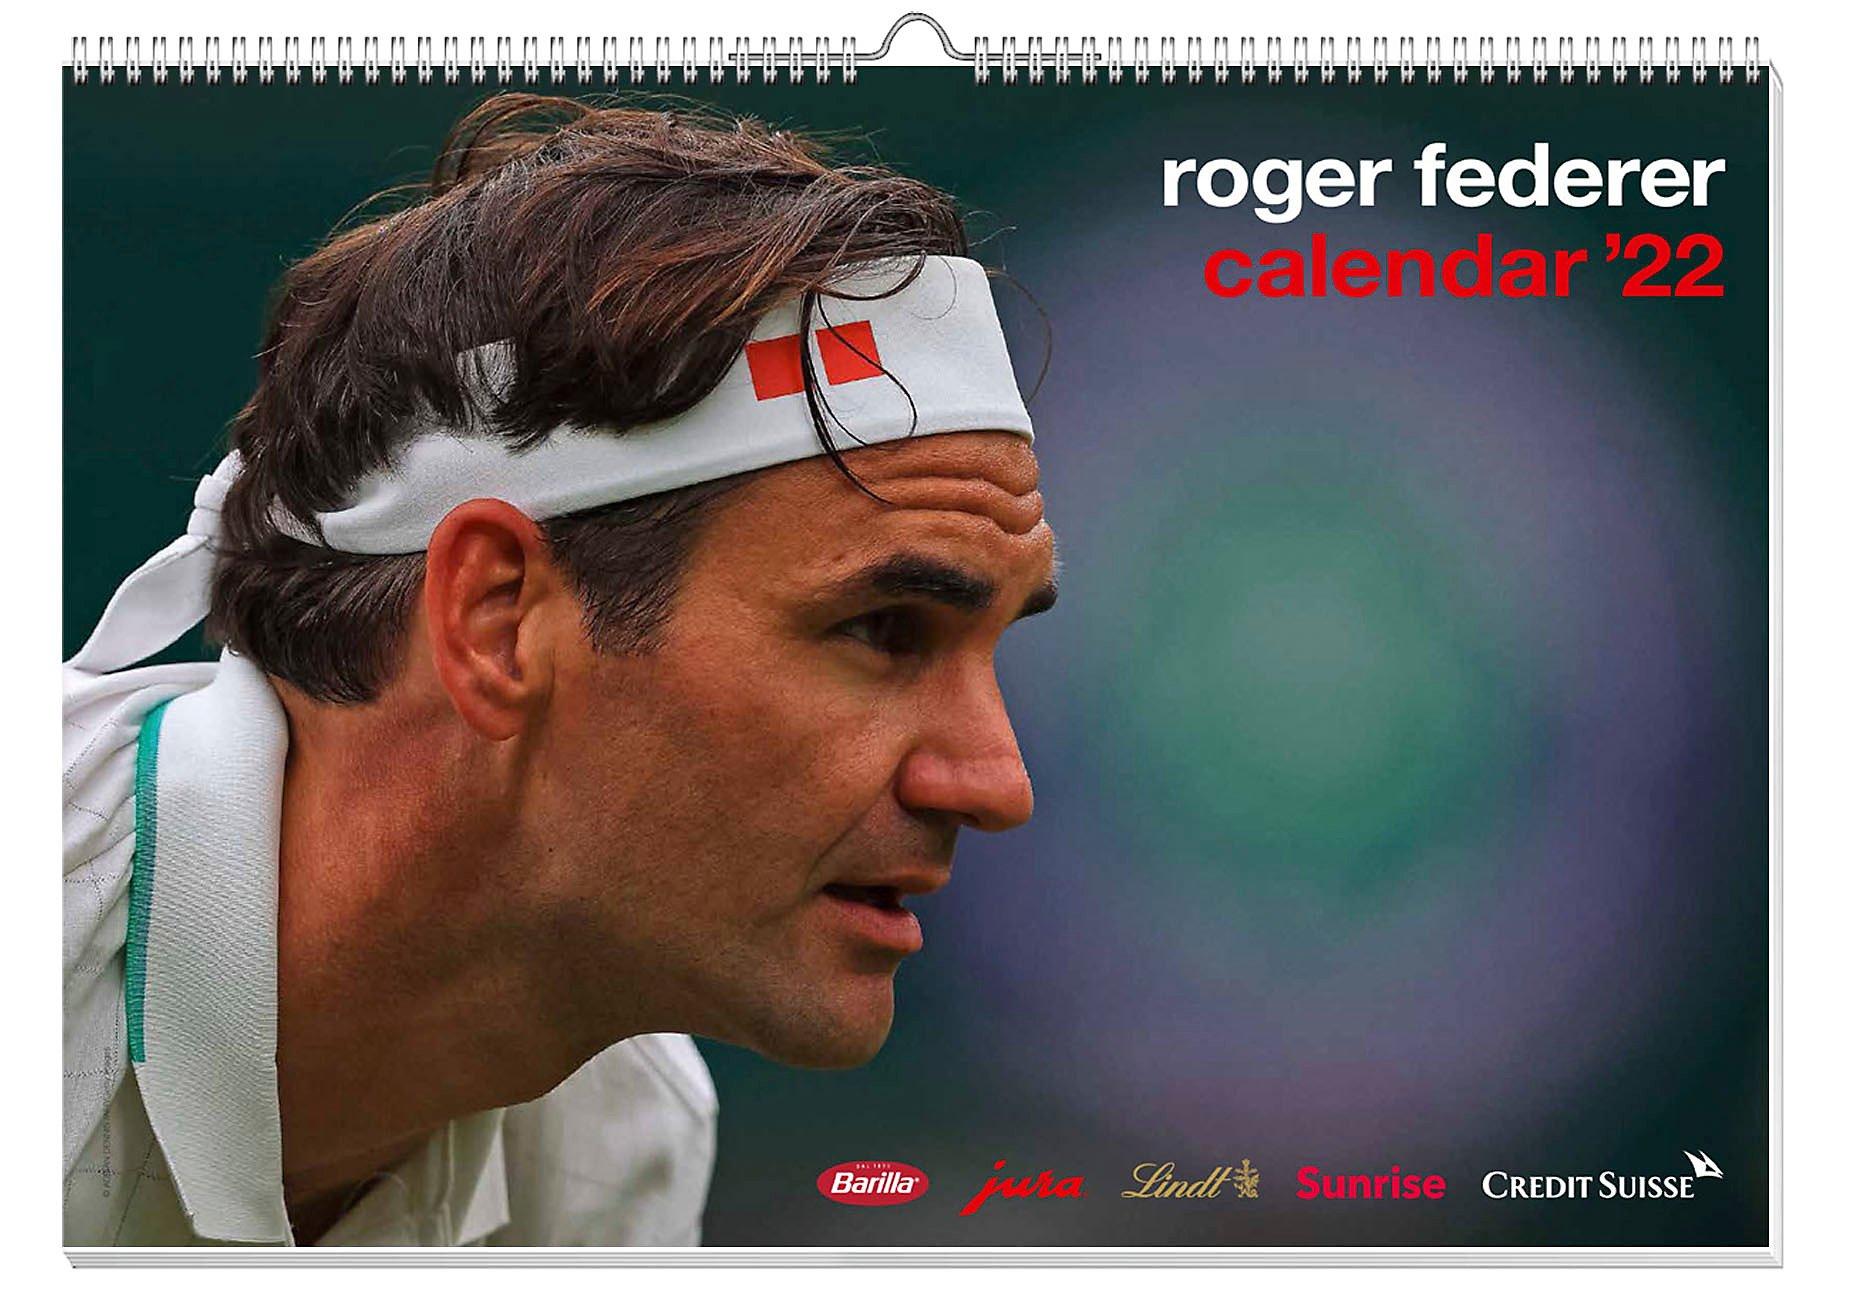 Roger federer 2020